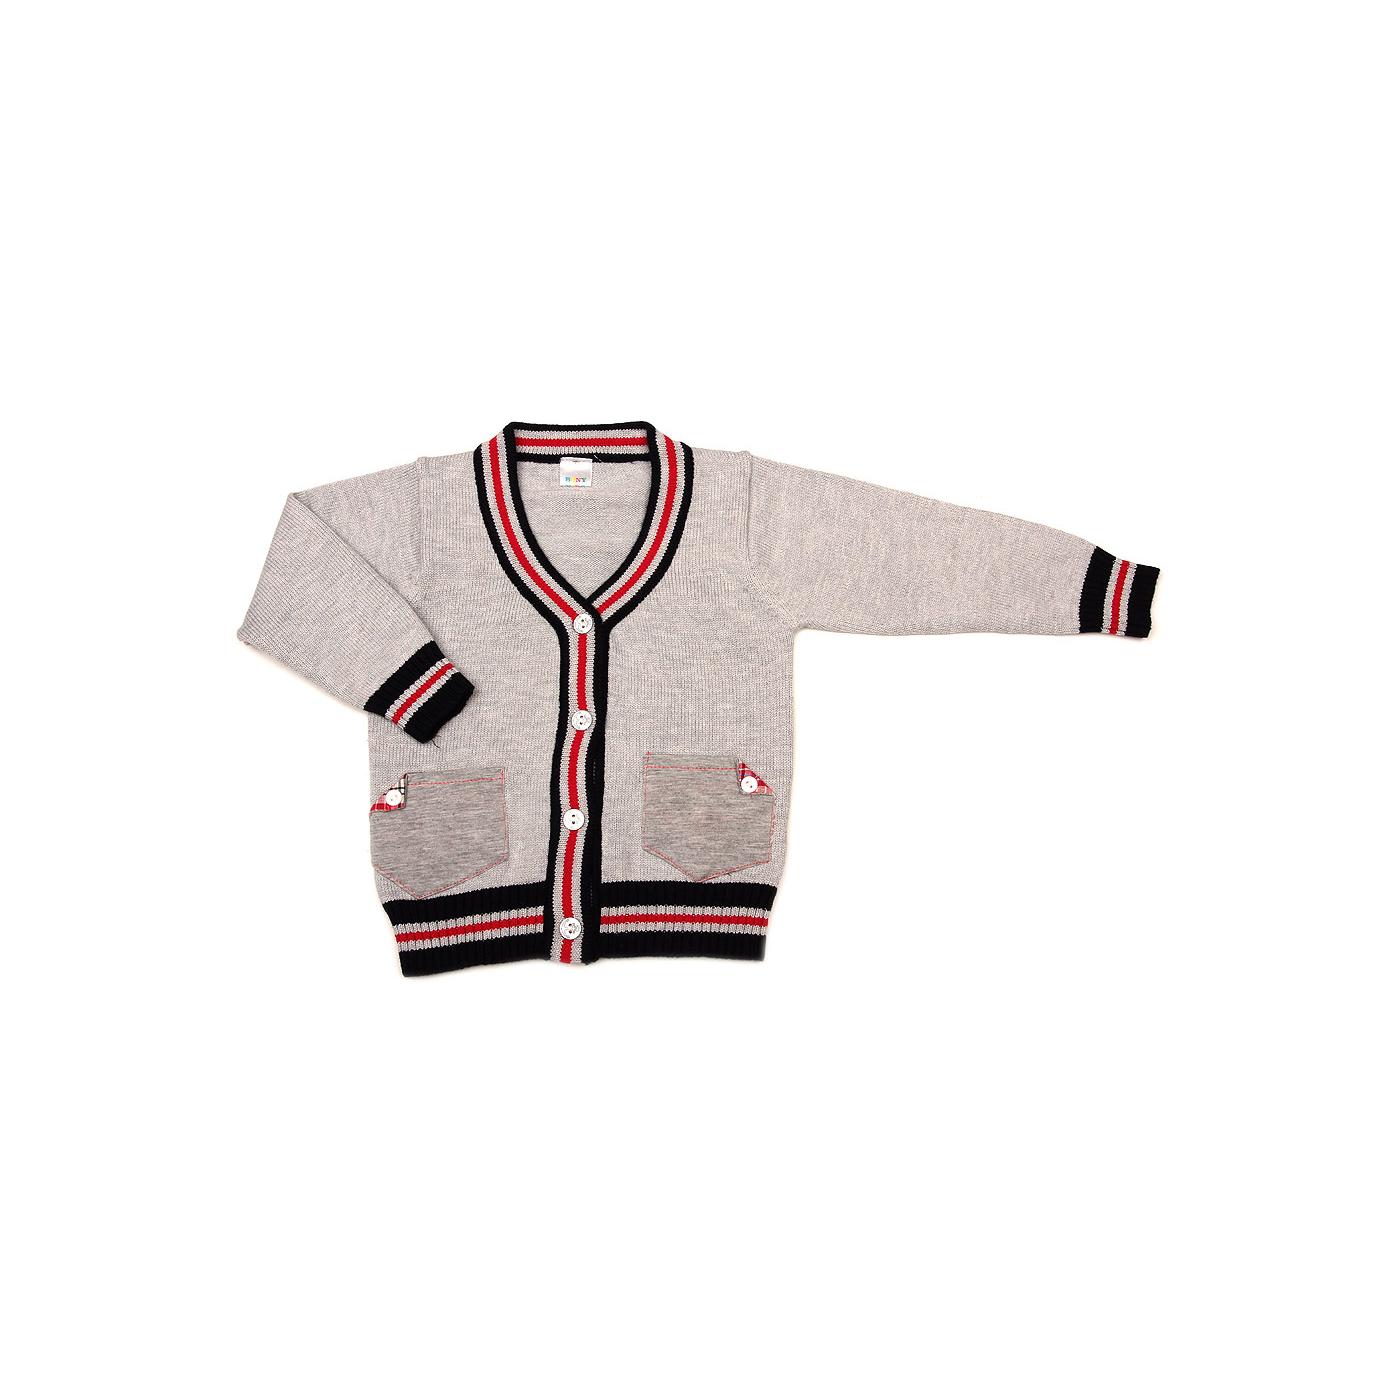 Жакет Bony Kids с карманами, цвет - Серый Размер 92